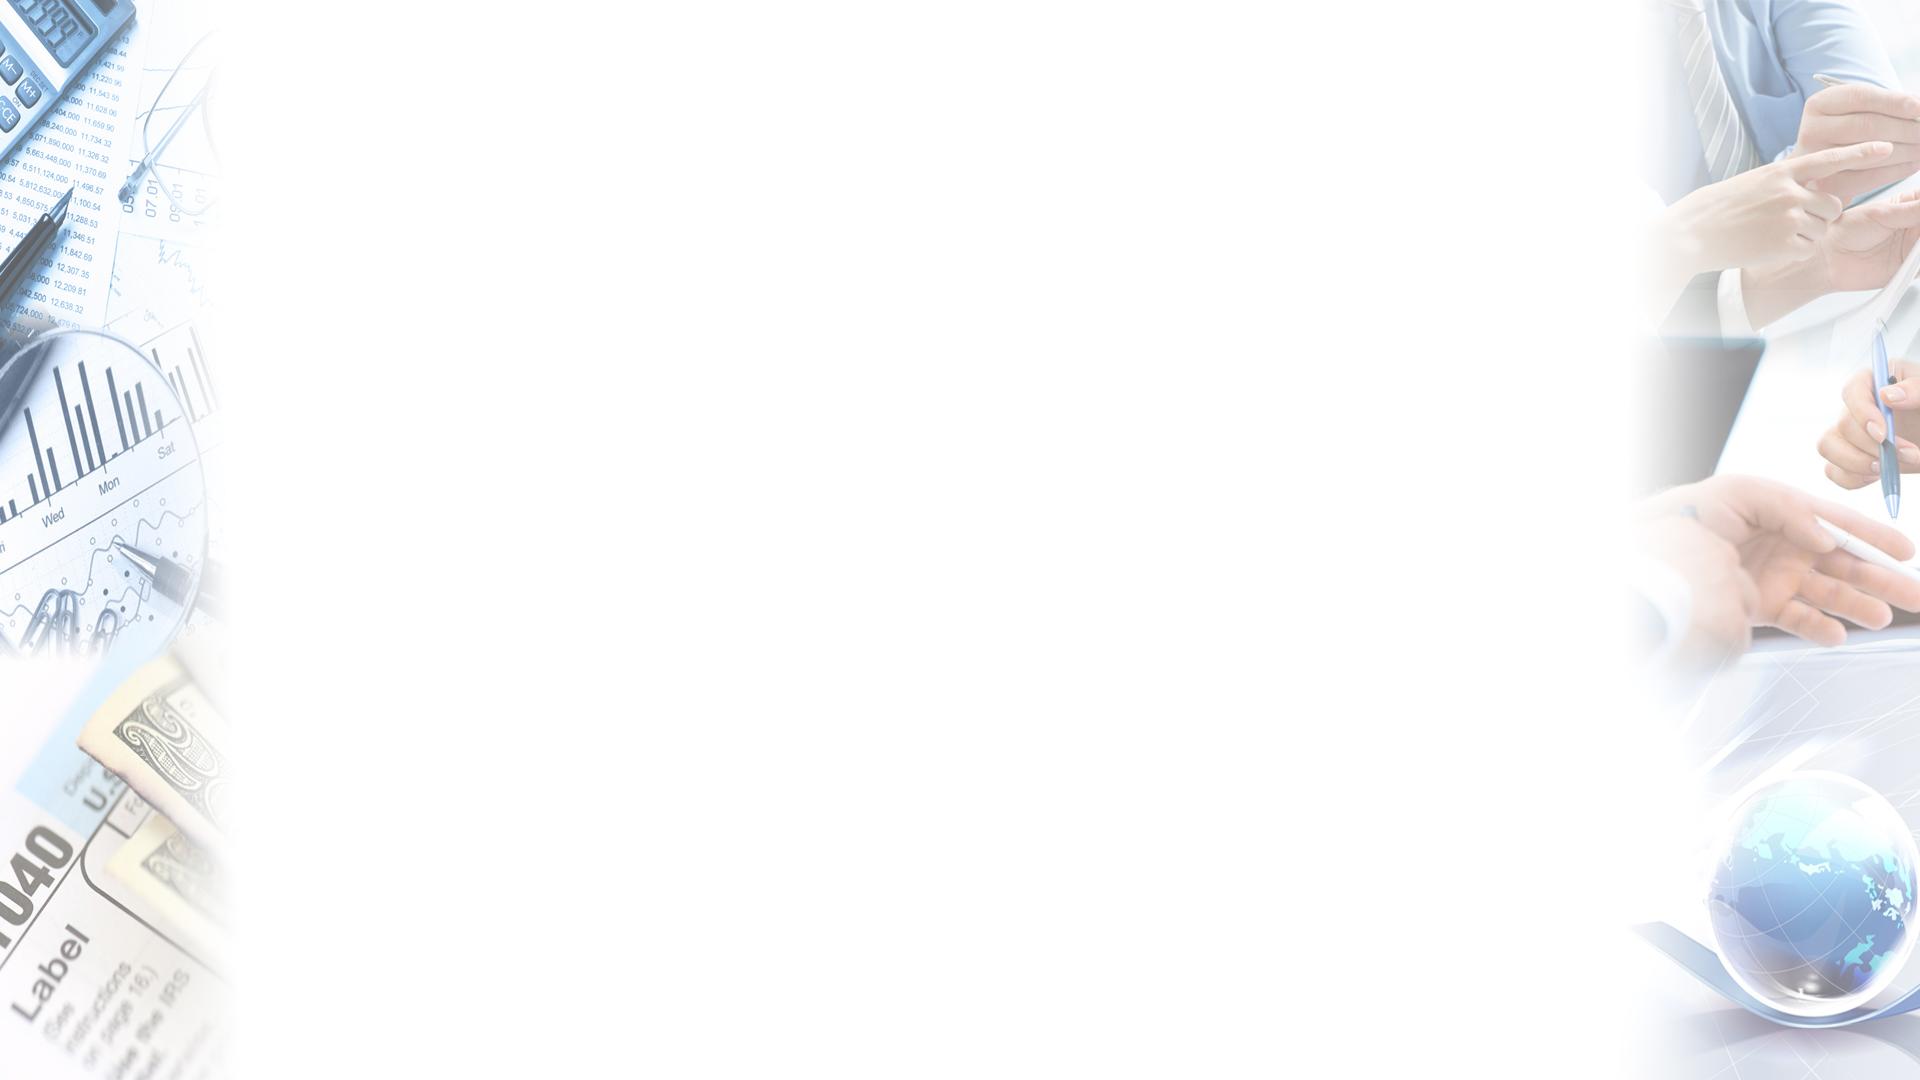 perodua background financial performance View at&t financial performance from mt3550 - entrepreneurship and small business mt4200 at national american university, wichita ks at& t financialperform ance g ida abdelaziz background inform.